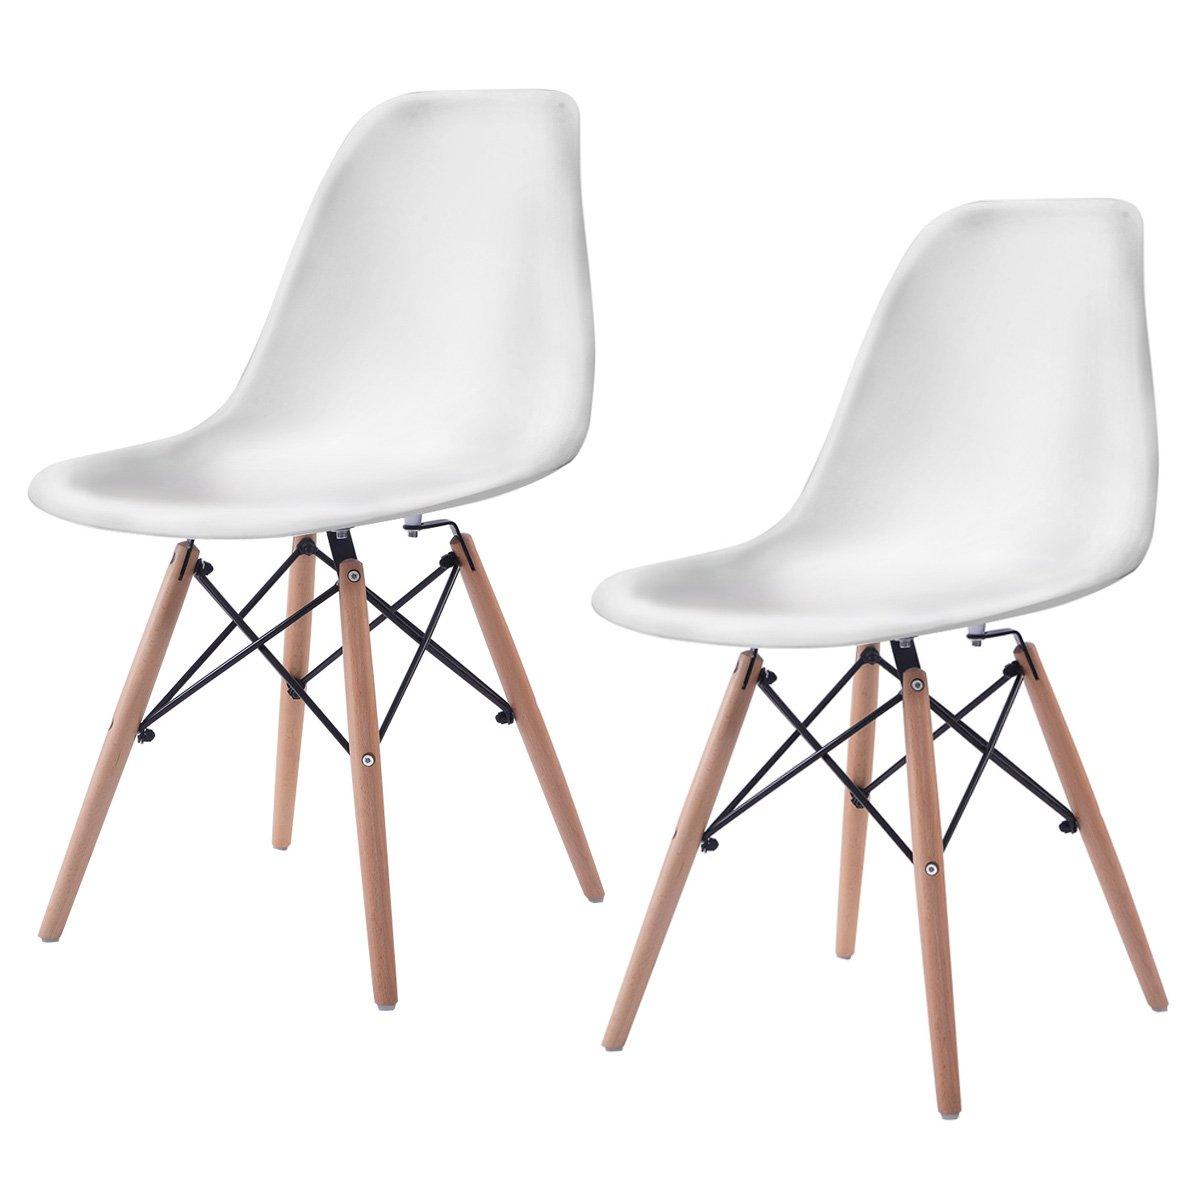 Giantex Set of 2 Mid Century Modern Style DSW Dining Side Chair Wood Leg